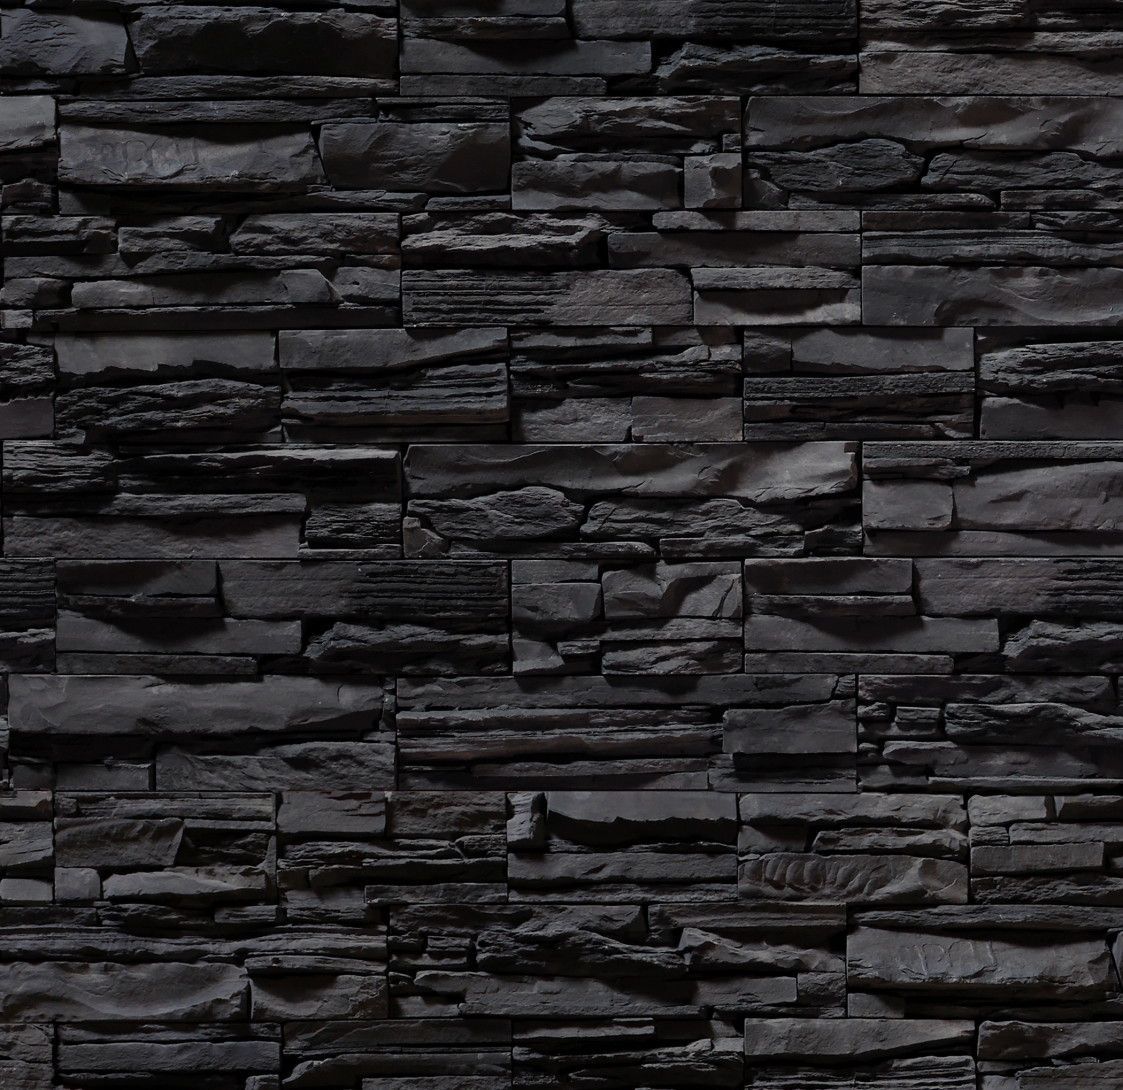 Papel de Parede Pedras Naturais 3DBE6F